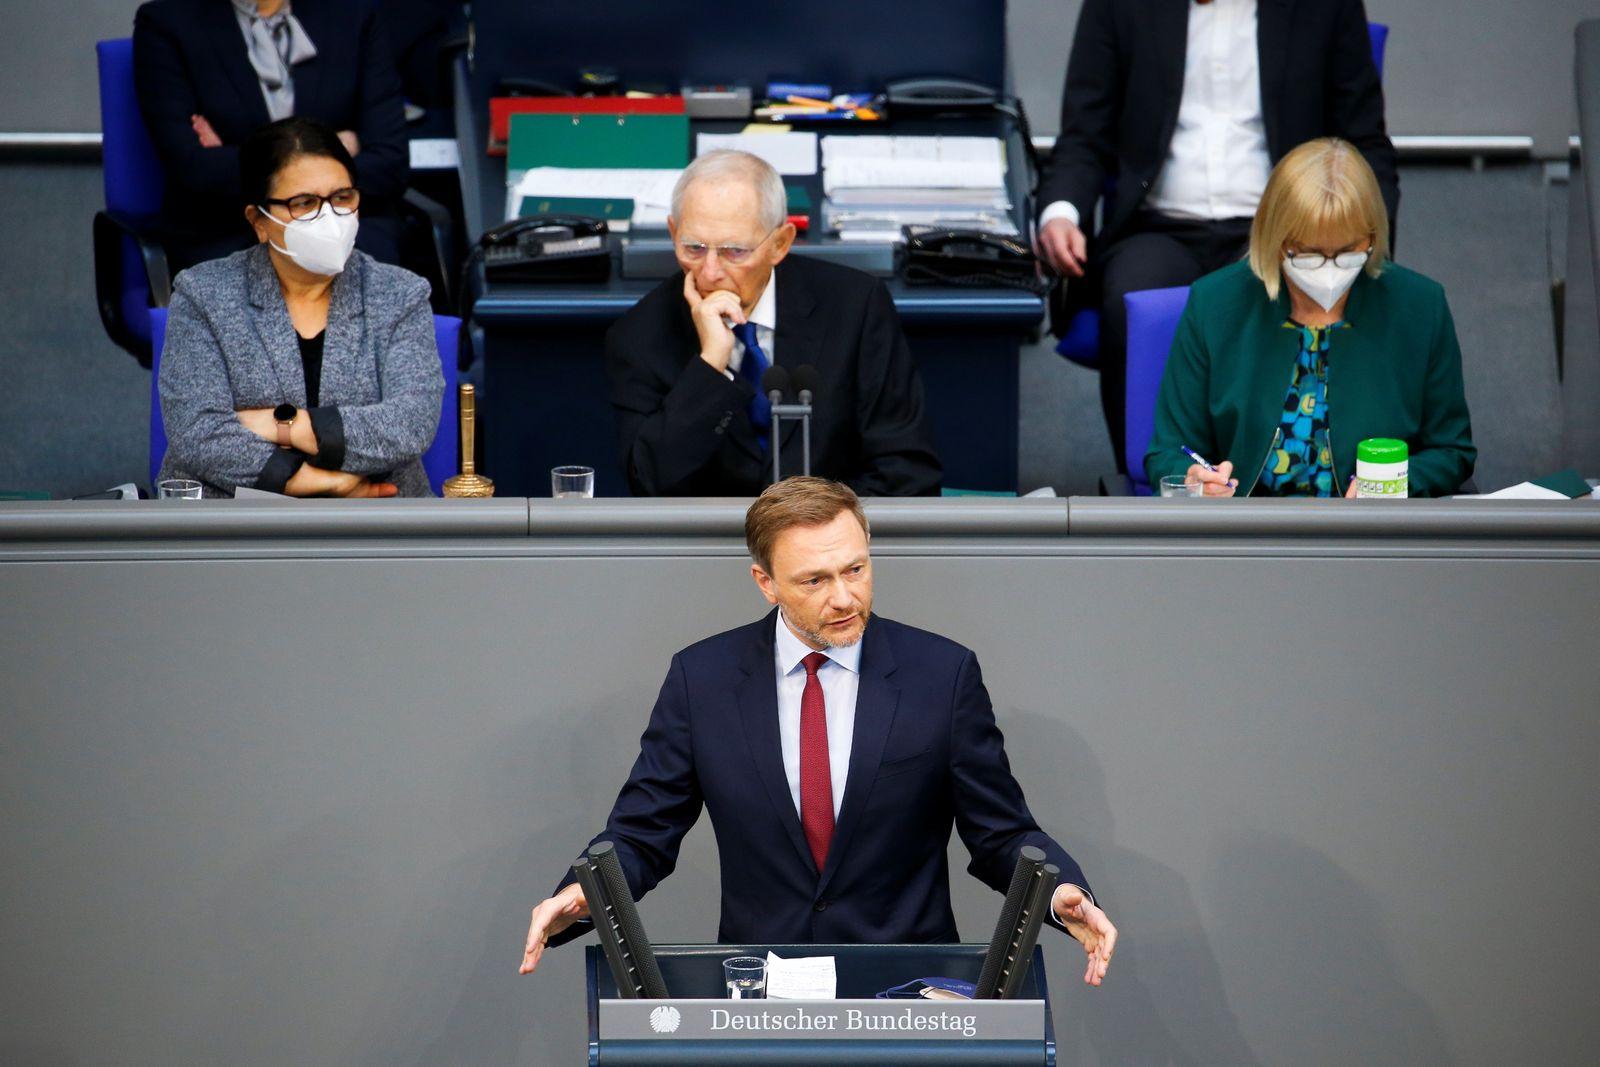 Session of the German Bundestag in Berlin